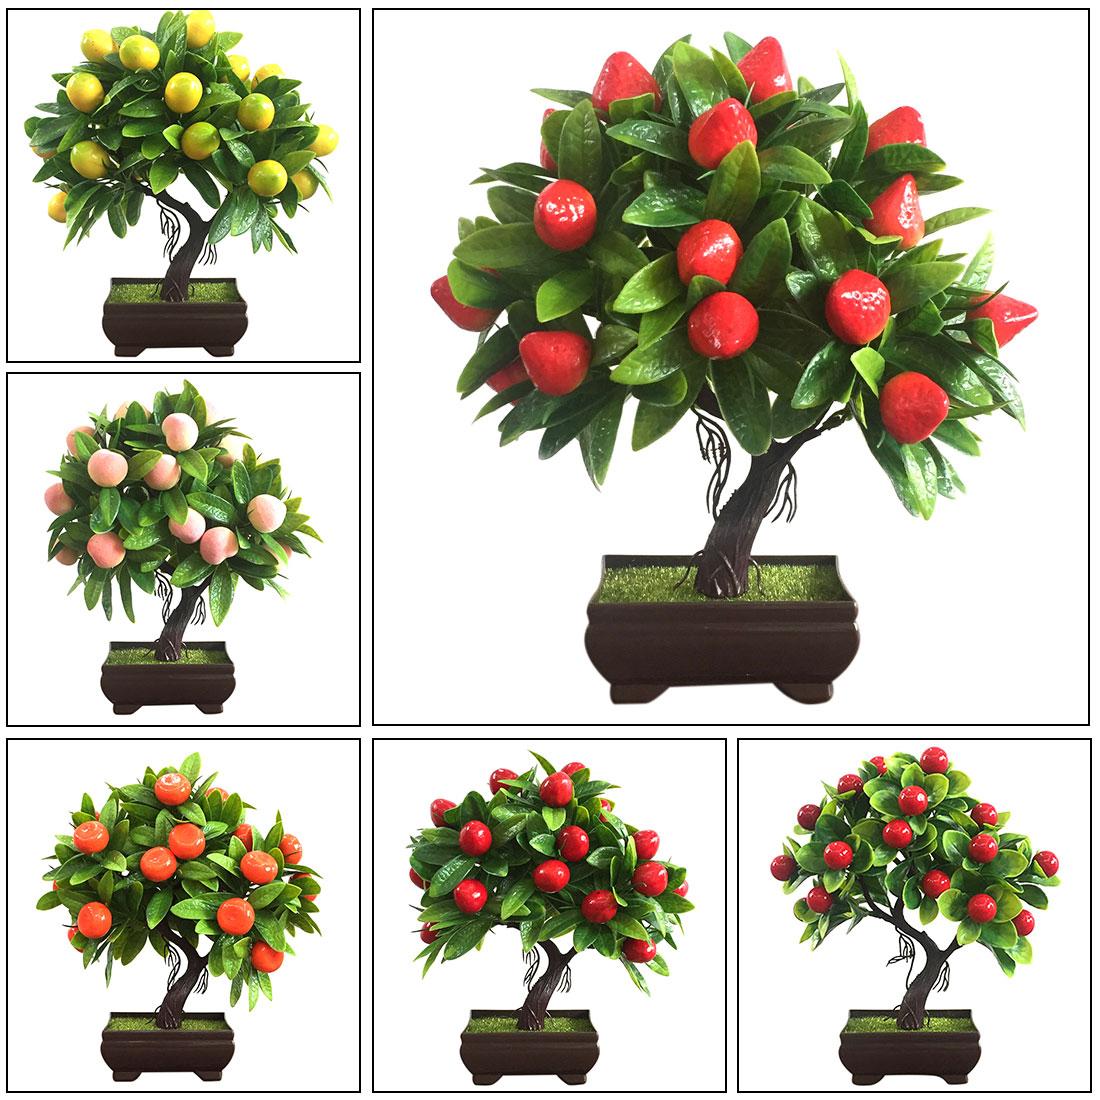 1pcs Artificial Orange Plastic Pots+Small Fruit Tree Plant Bonsai Potted For Home Living Room Flower Set Shop Hotel Party Decor